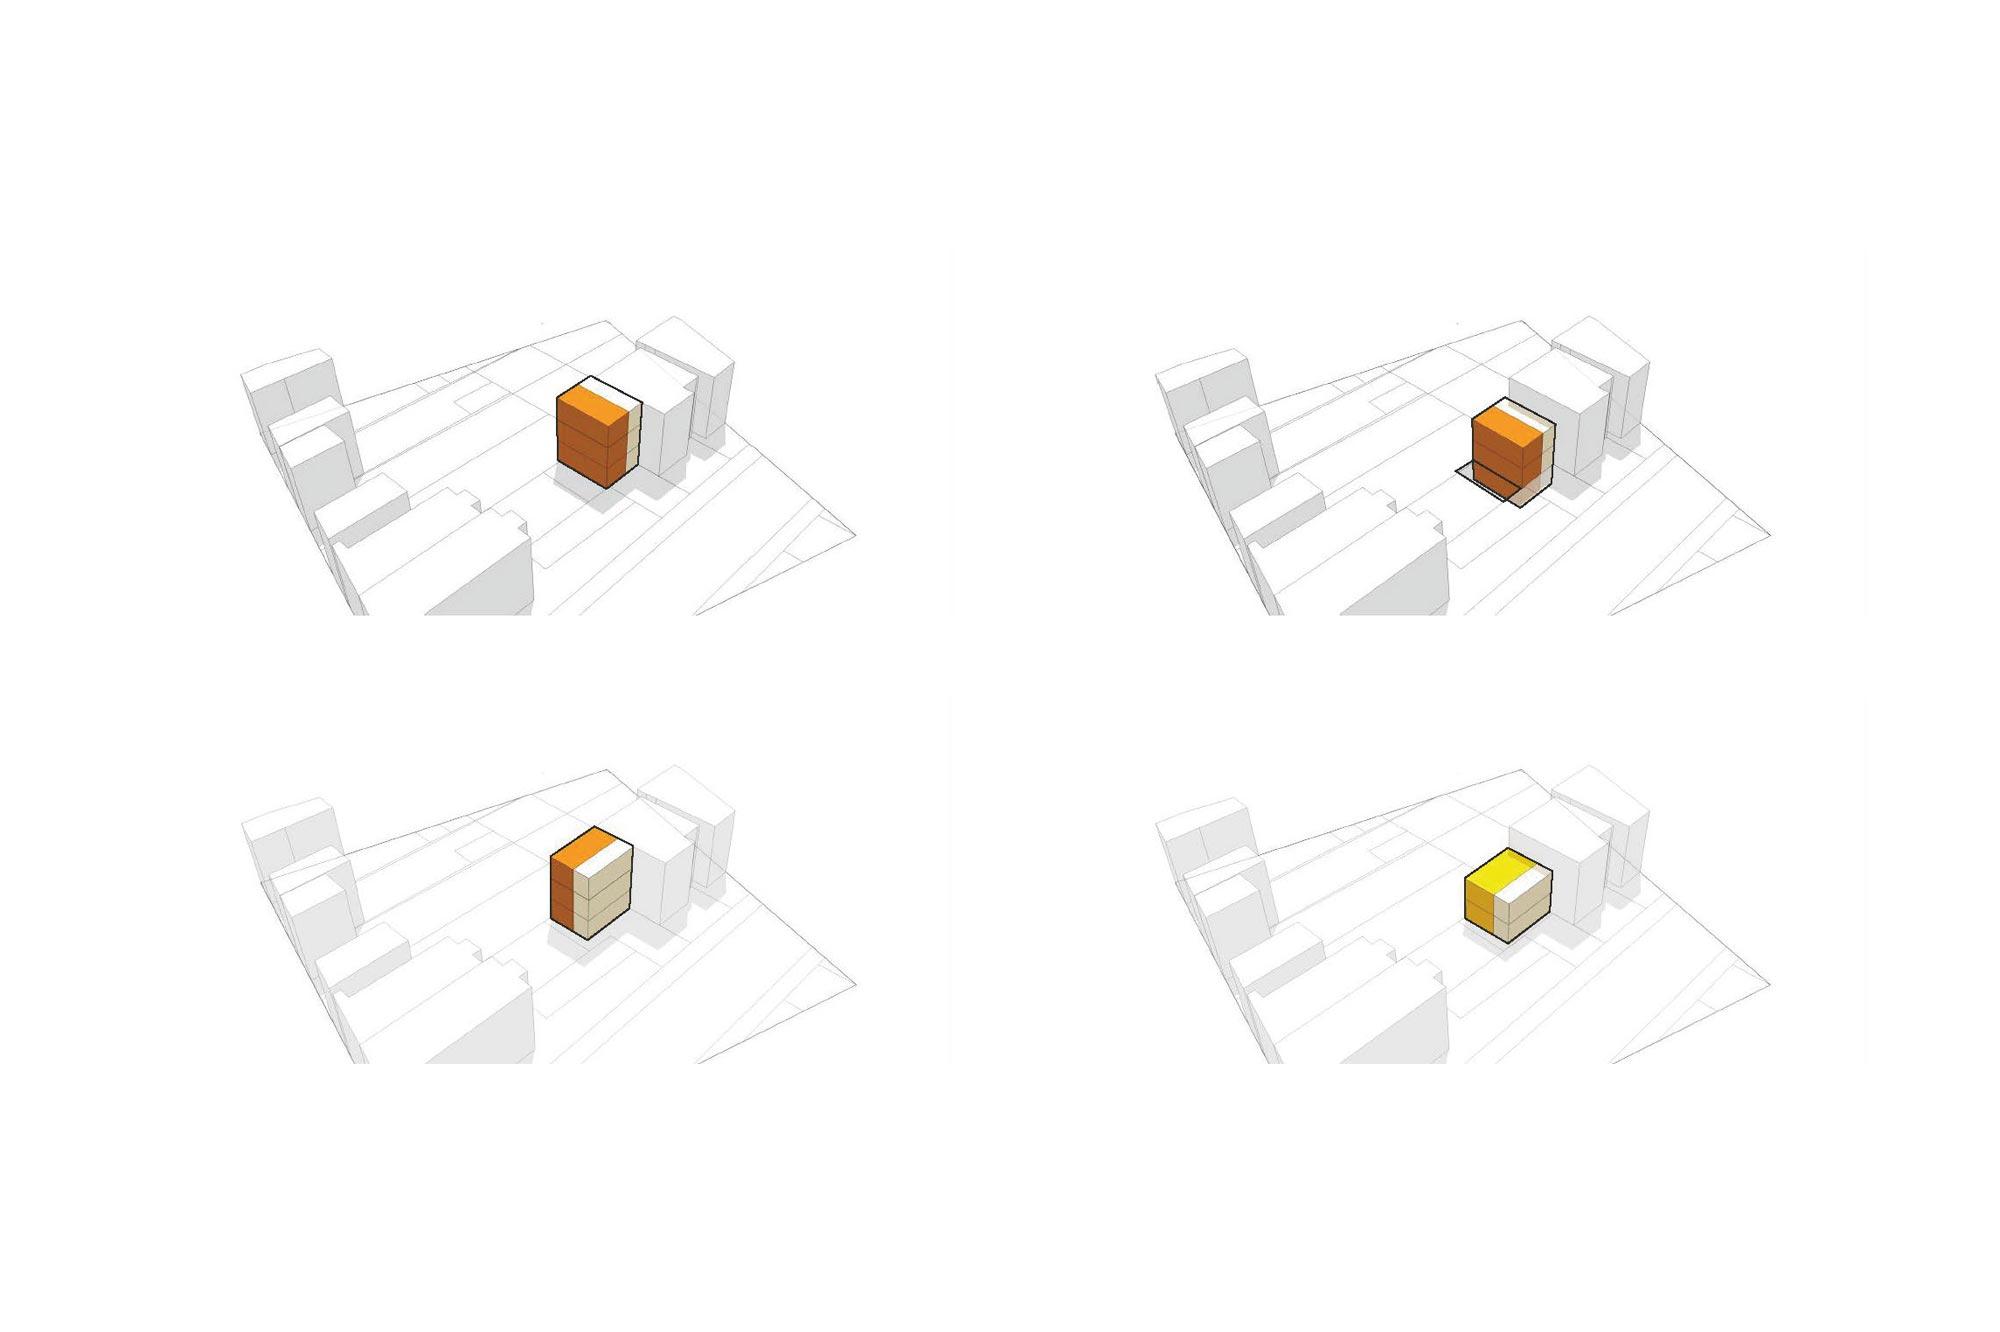 cube-haus-adjaye-associates-architects-cs-2000px-07